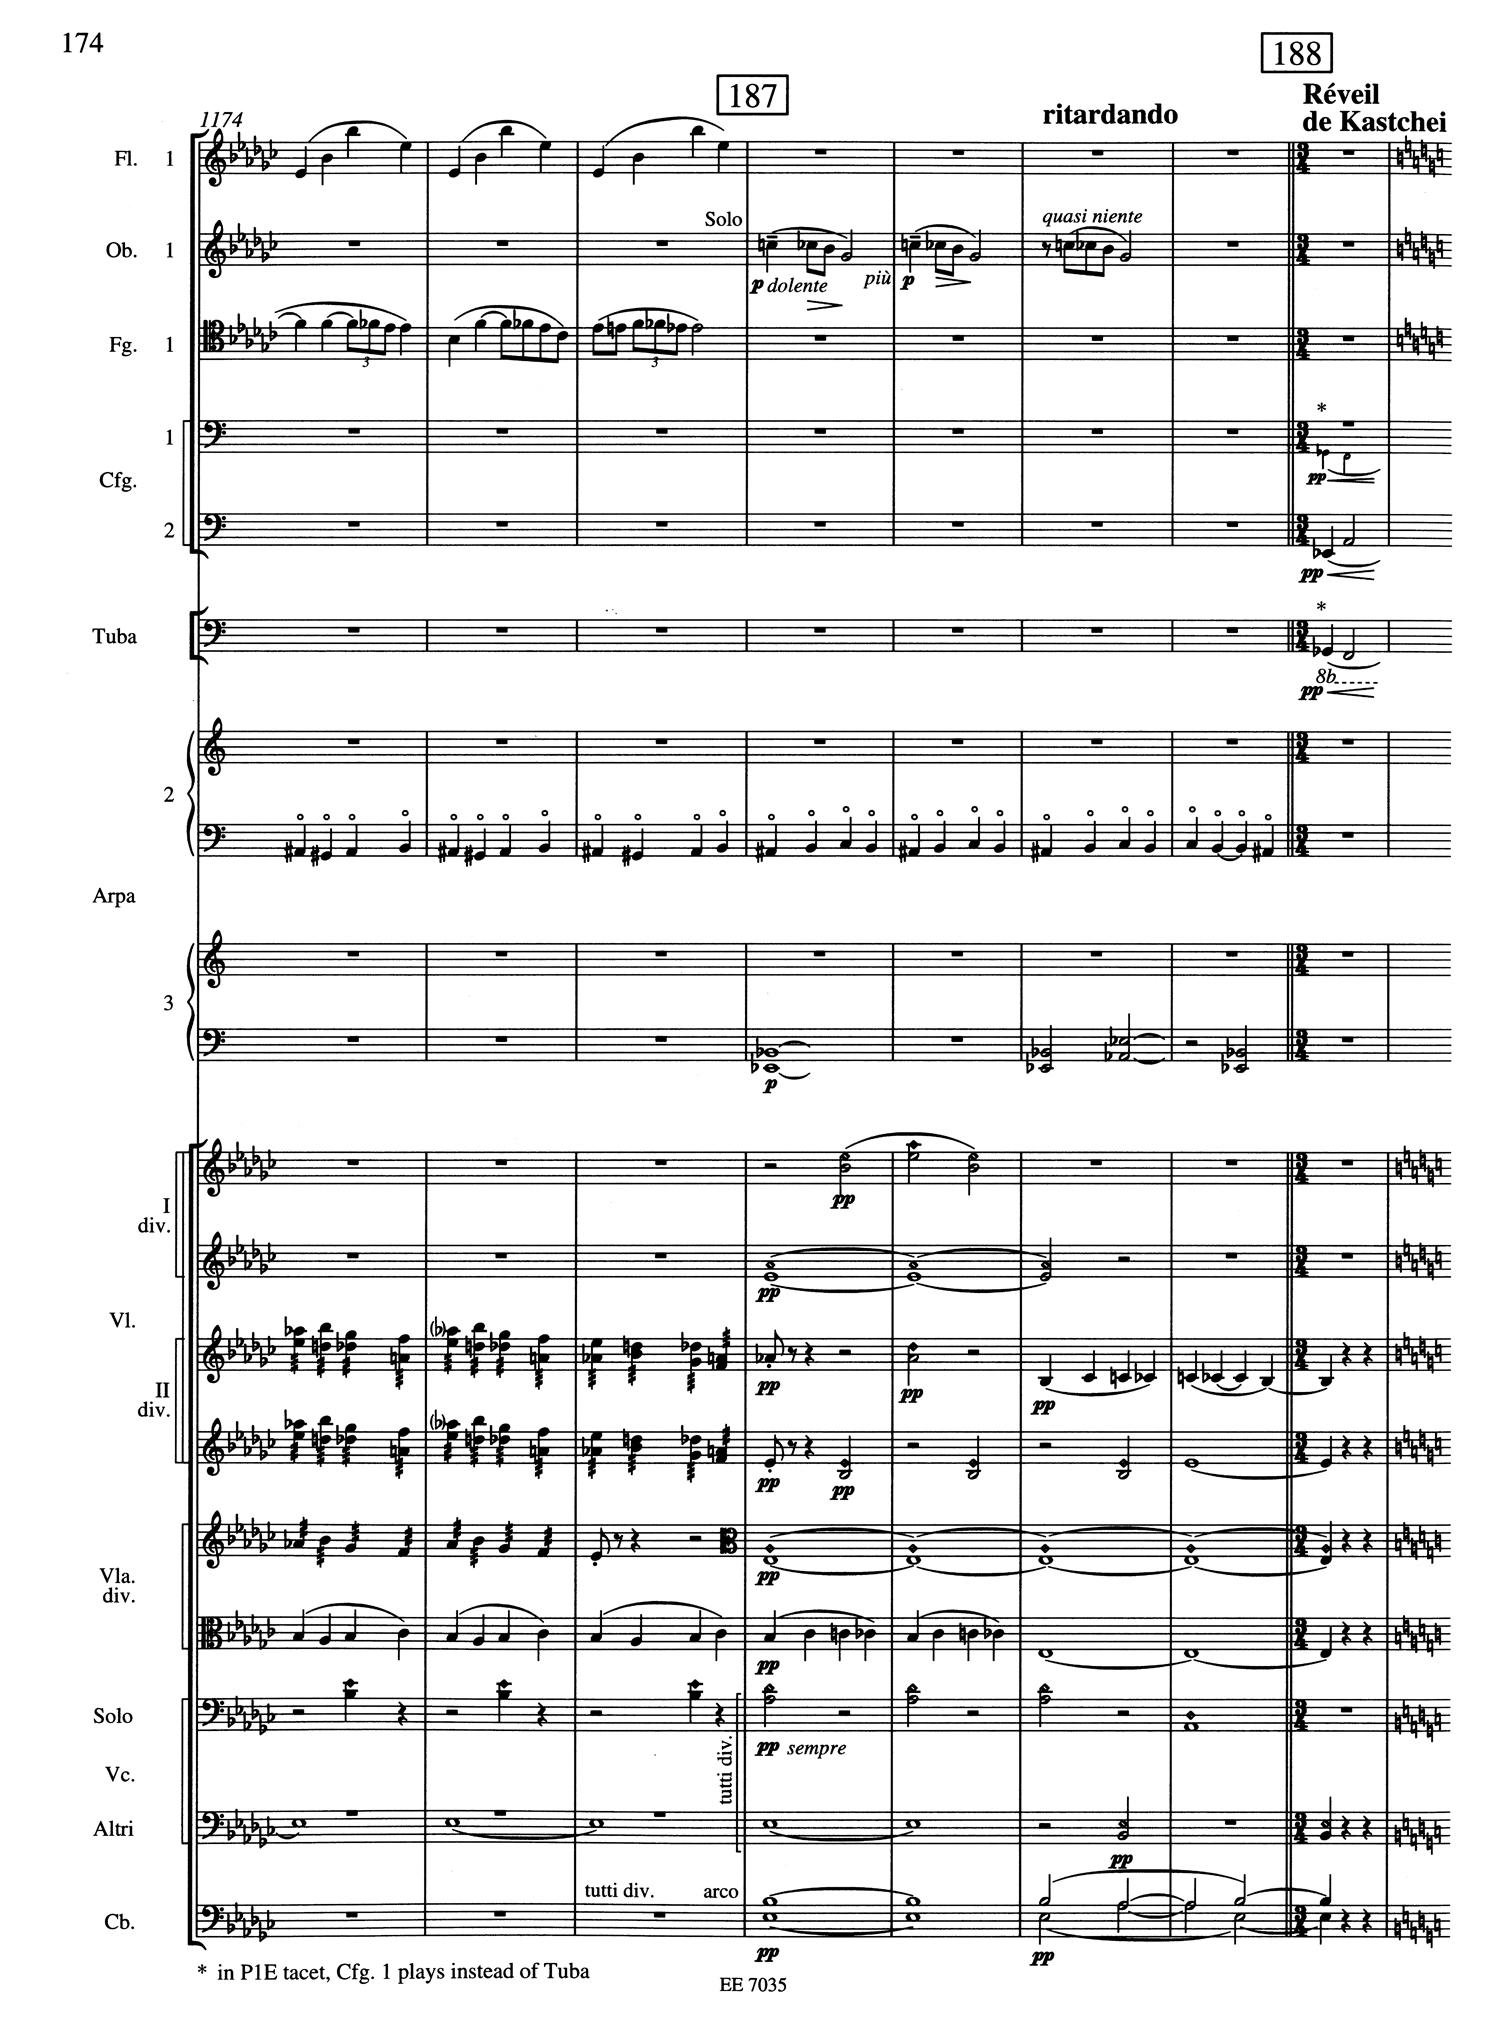 Firebird Score 4.jpg